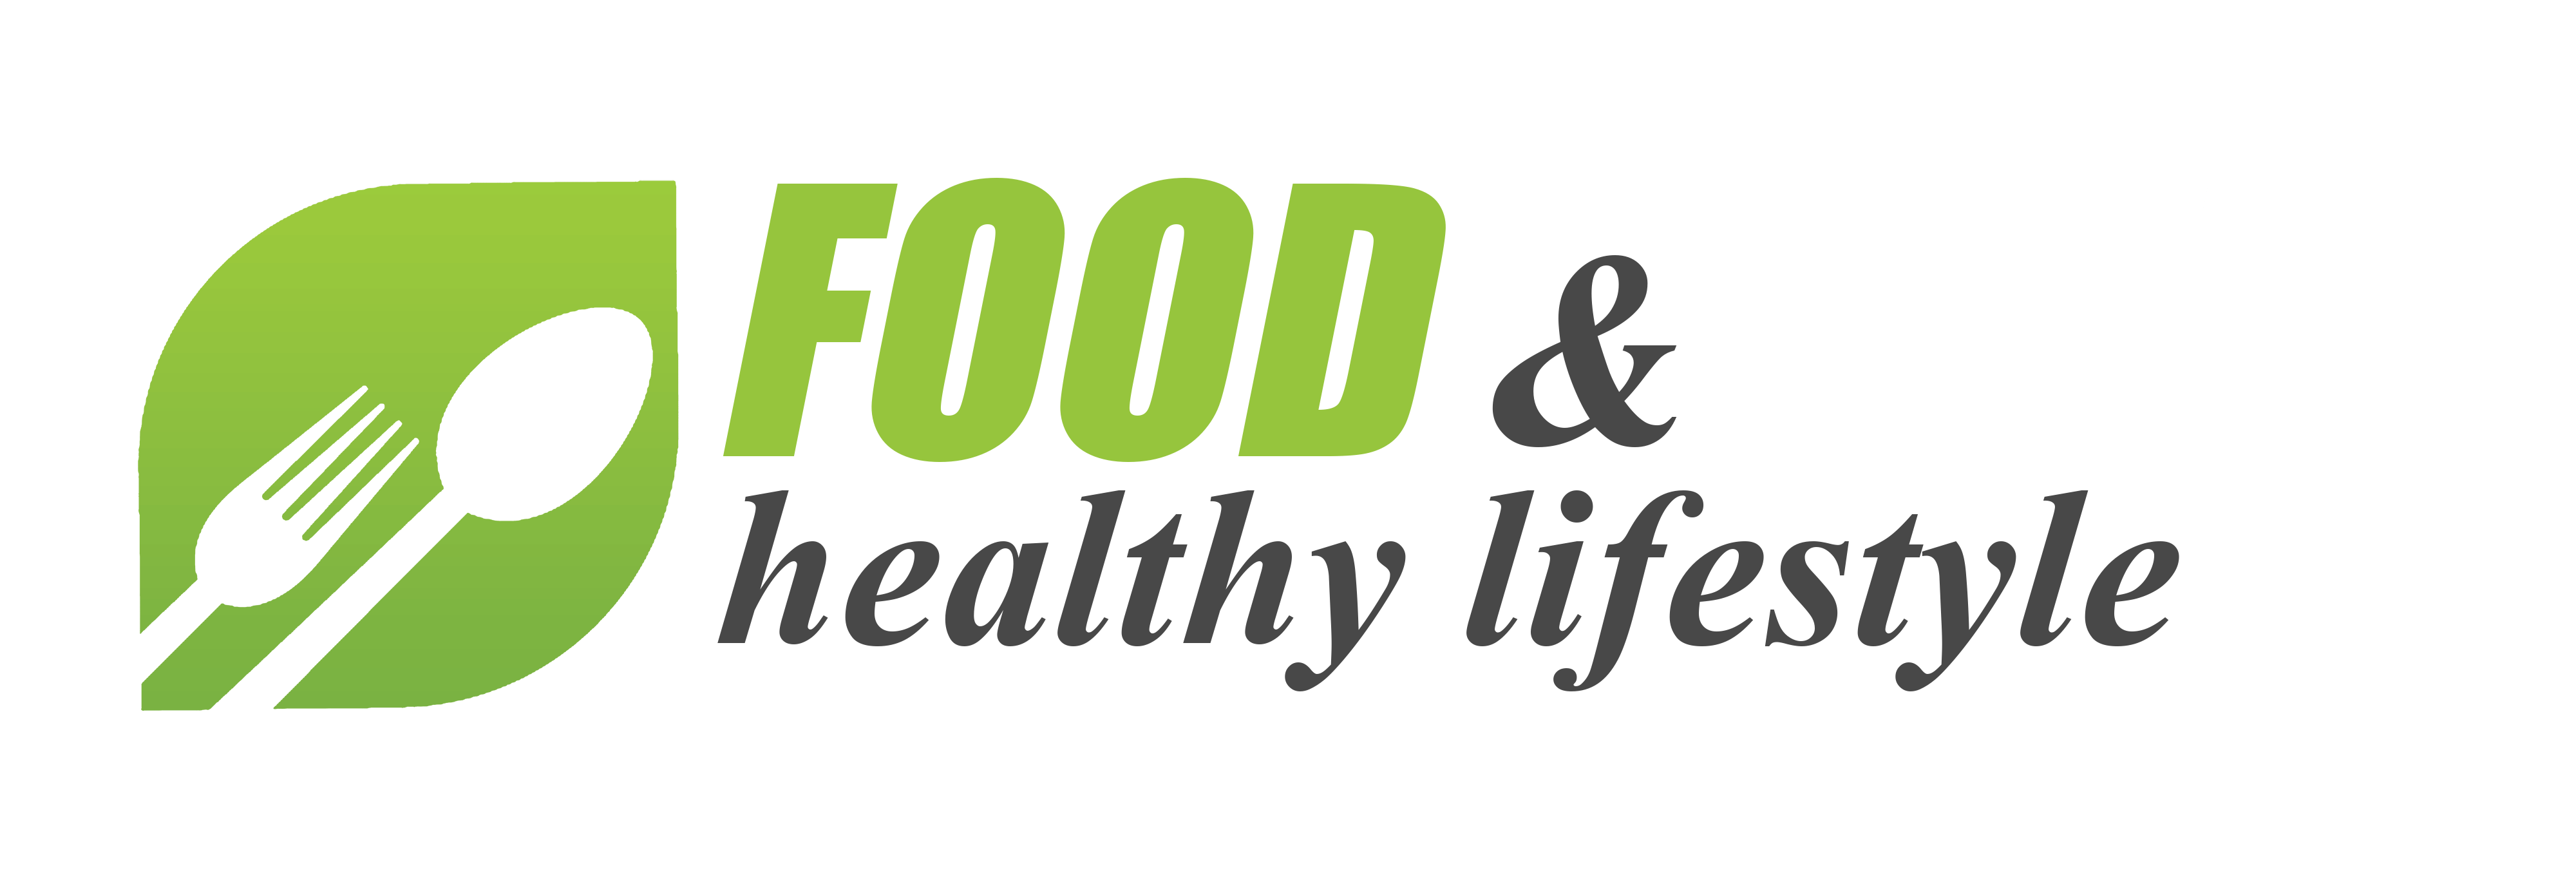 logo ff life style białe f